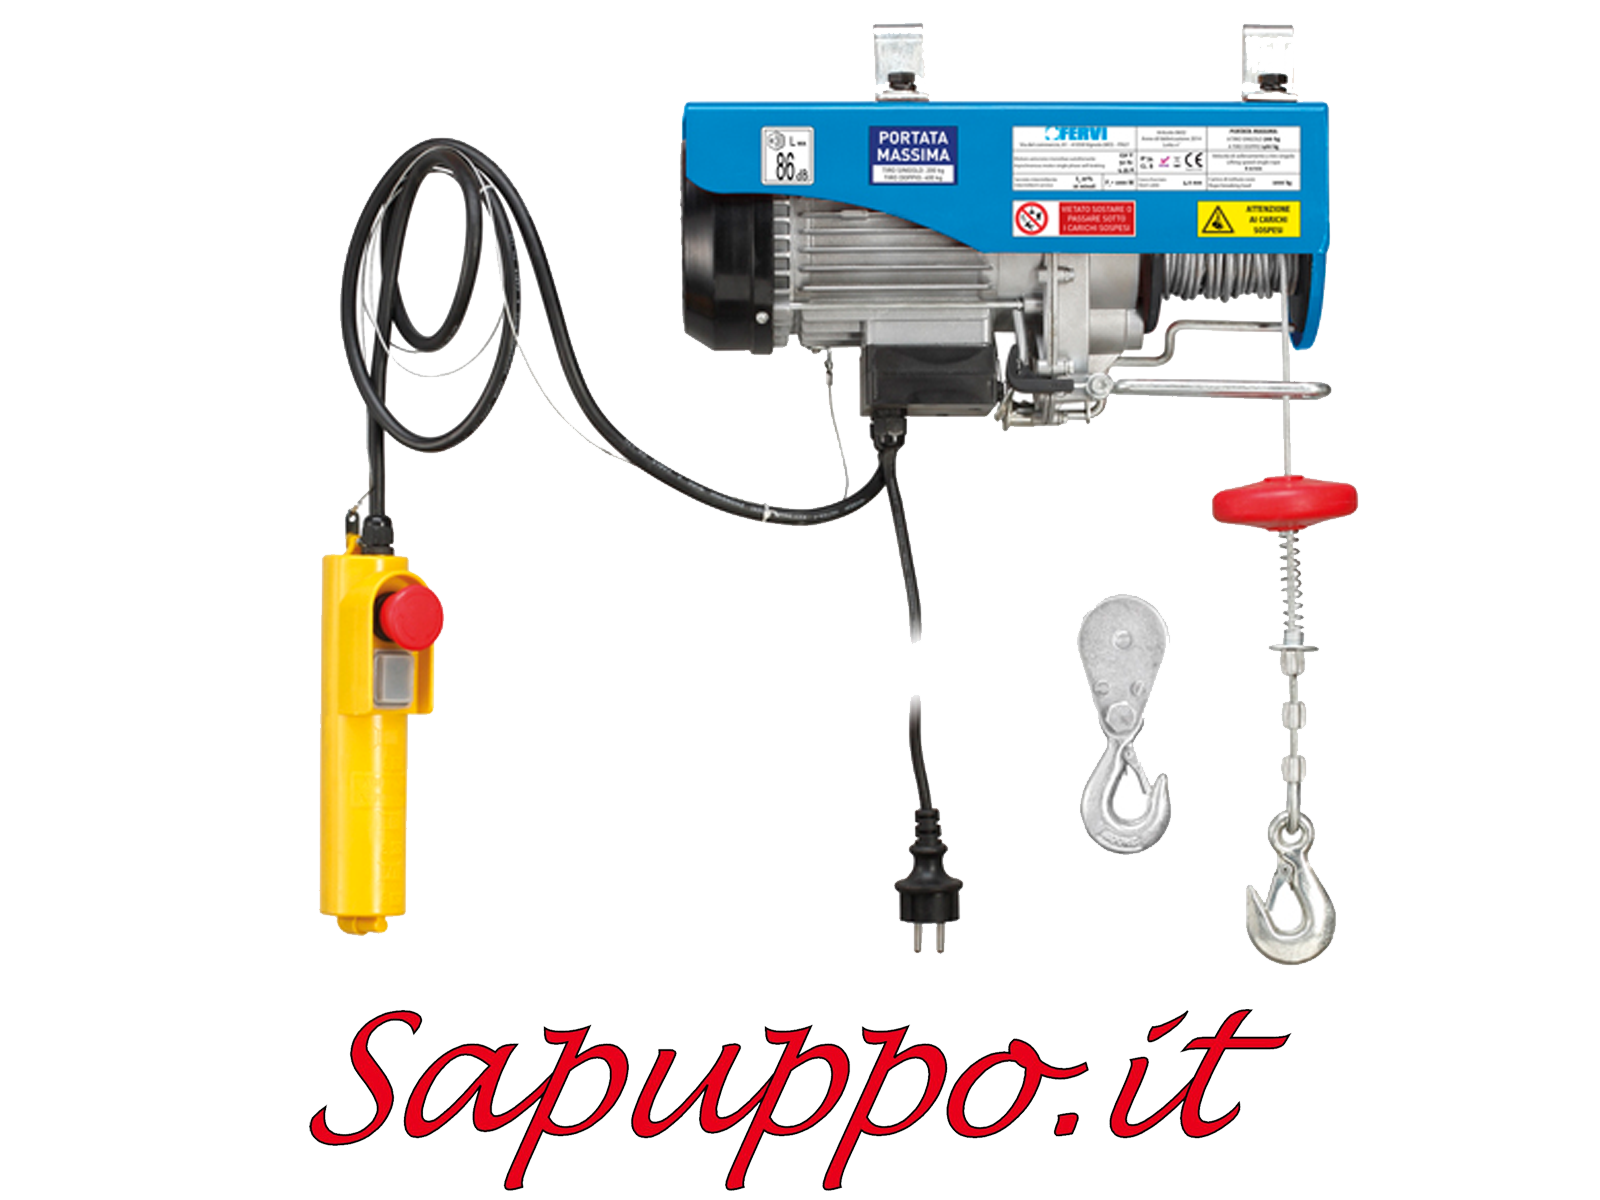 Paranco elettrico kg 200 400 fervi 0602 for Paranco elettrico 1000 kg